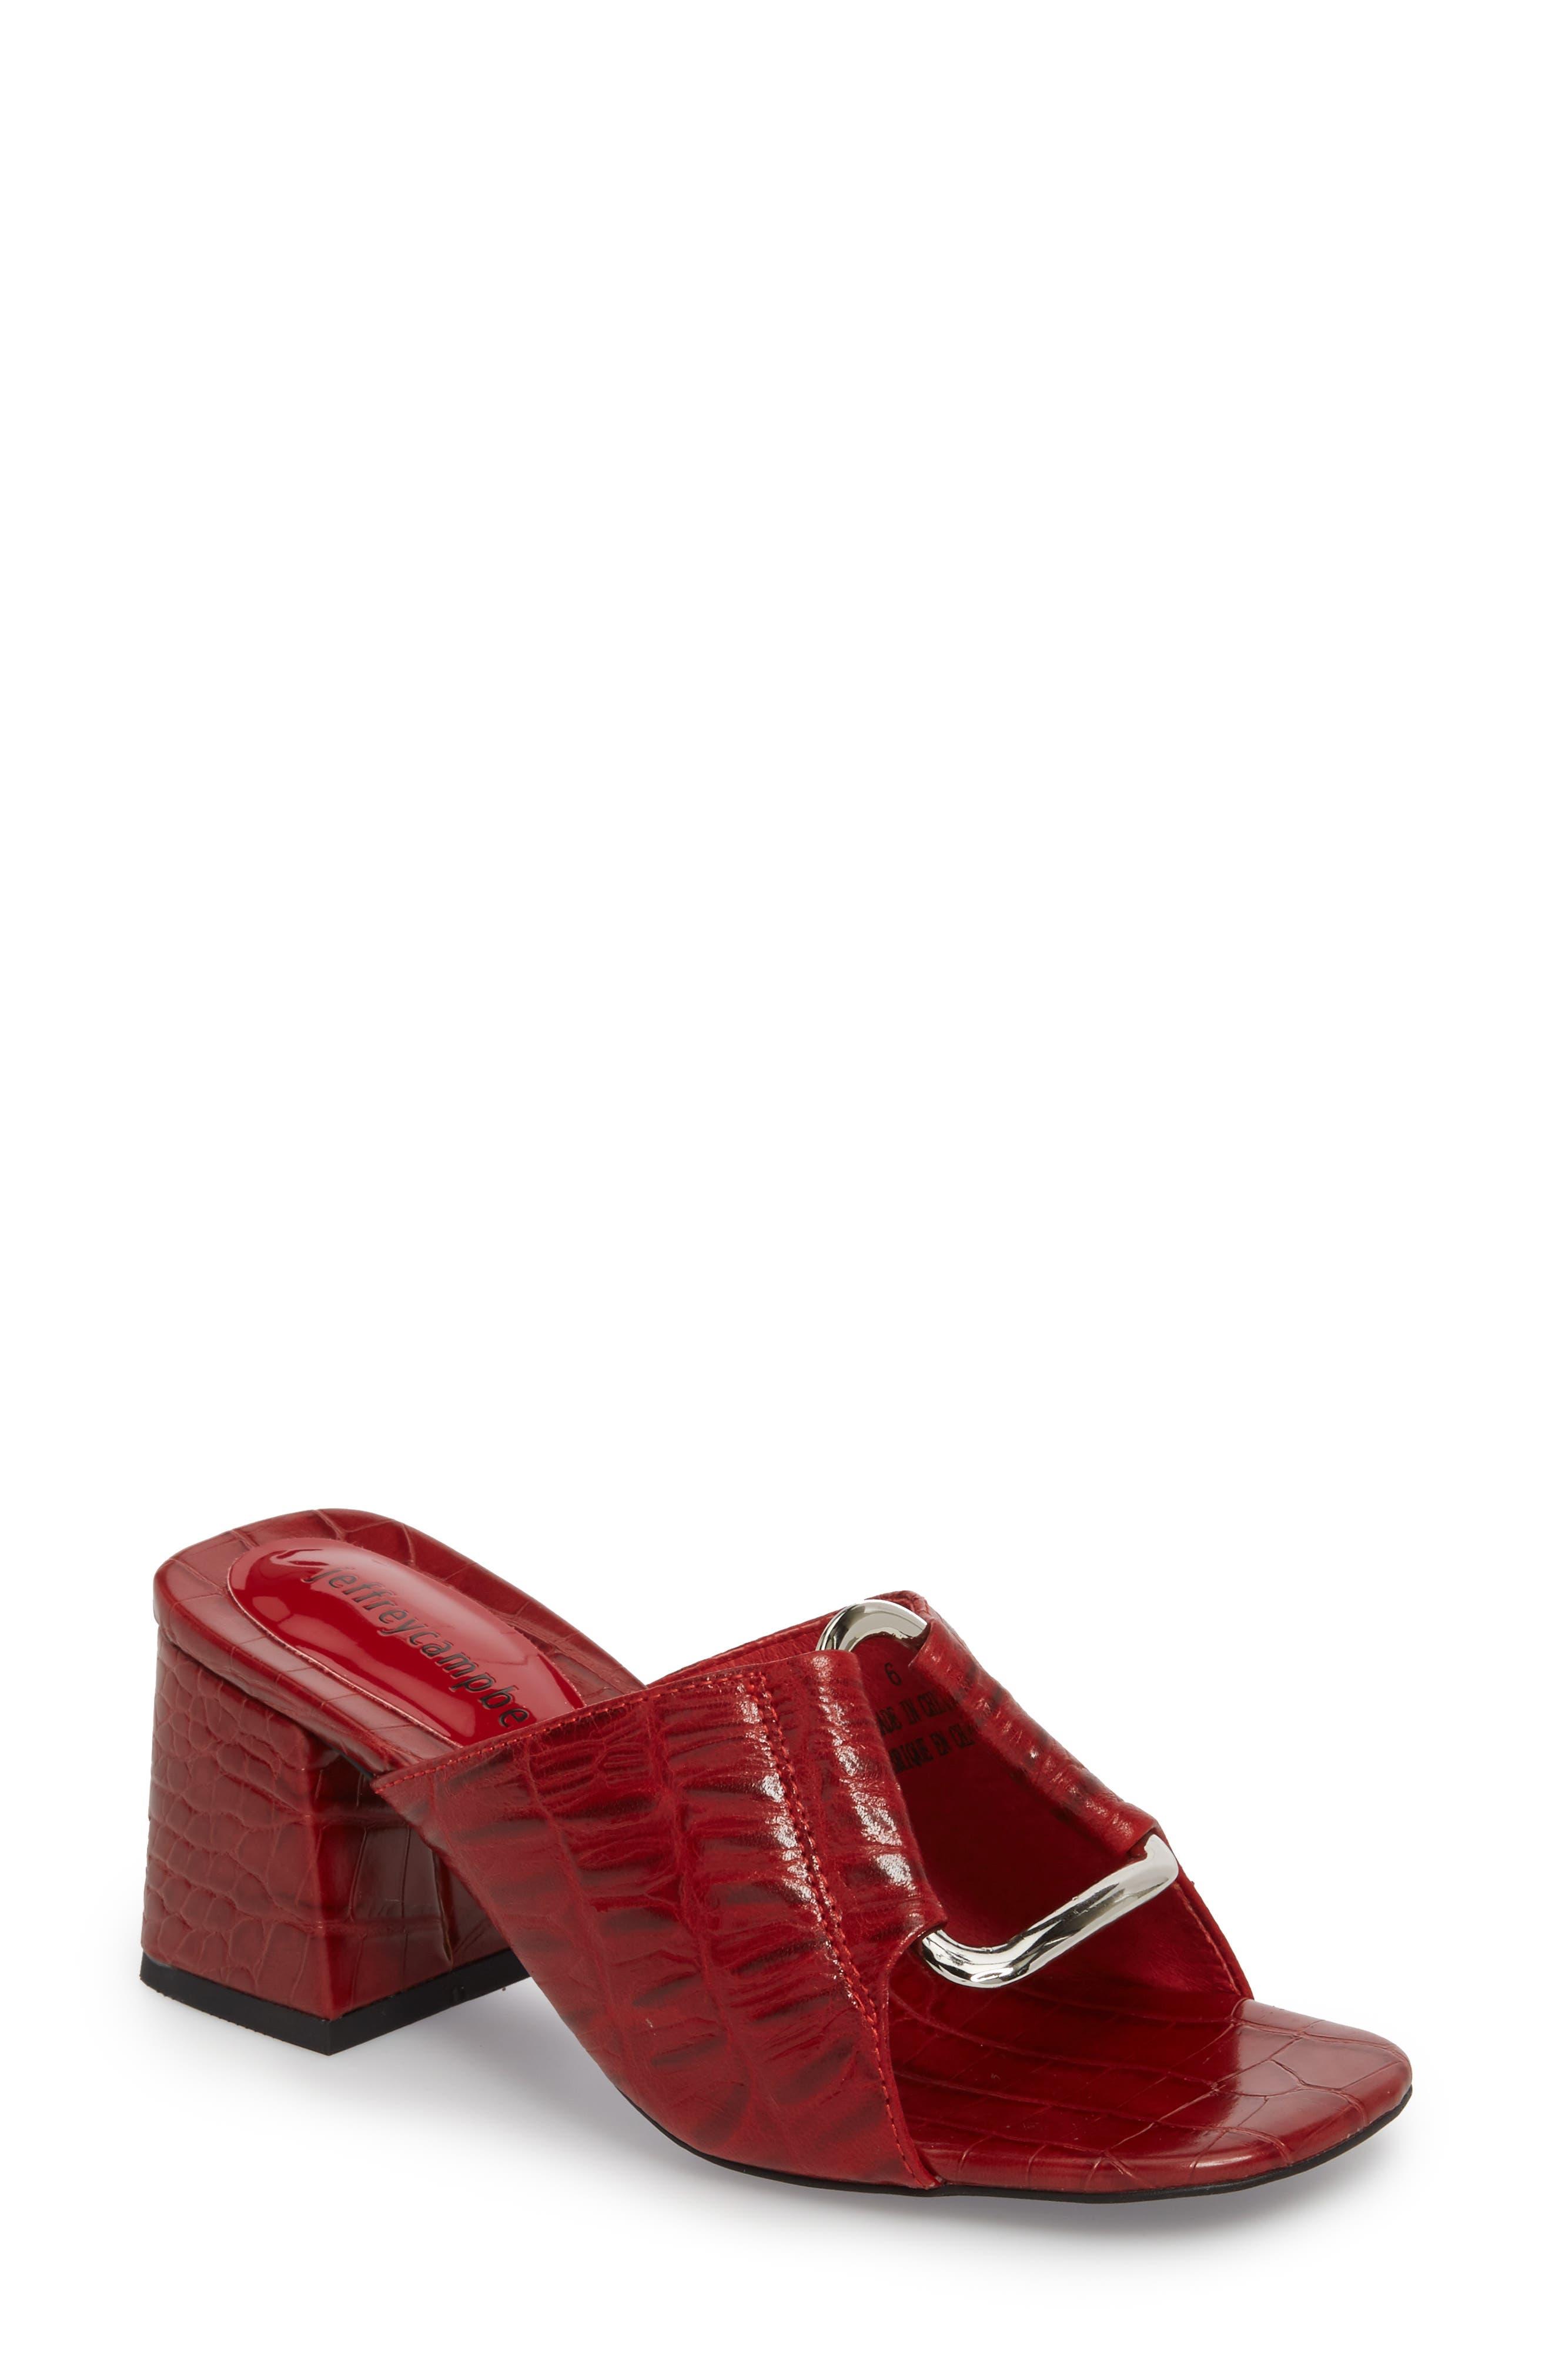 Main Image - Jeffrey Campbell Milagro Flared Heel Sandal (Women)